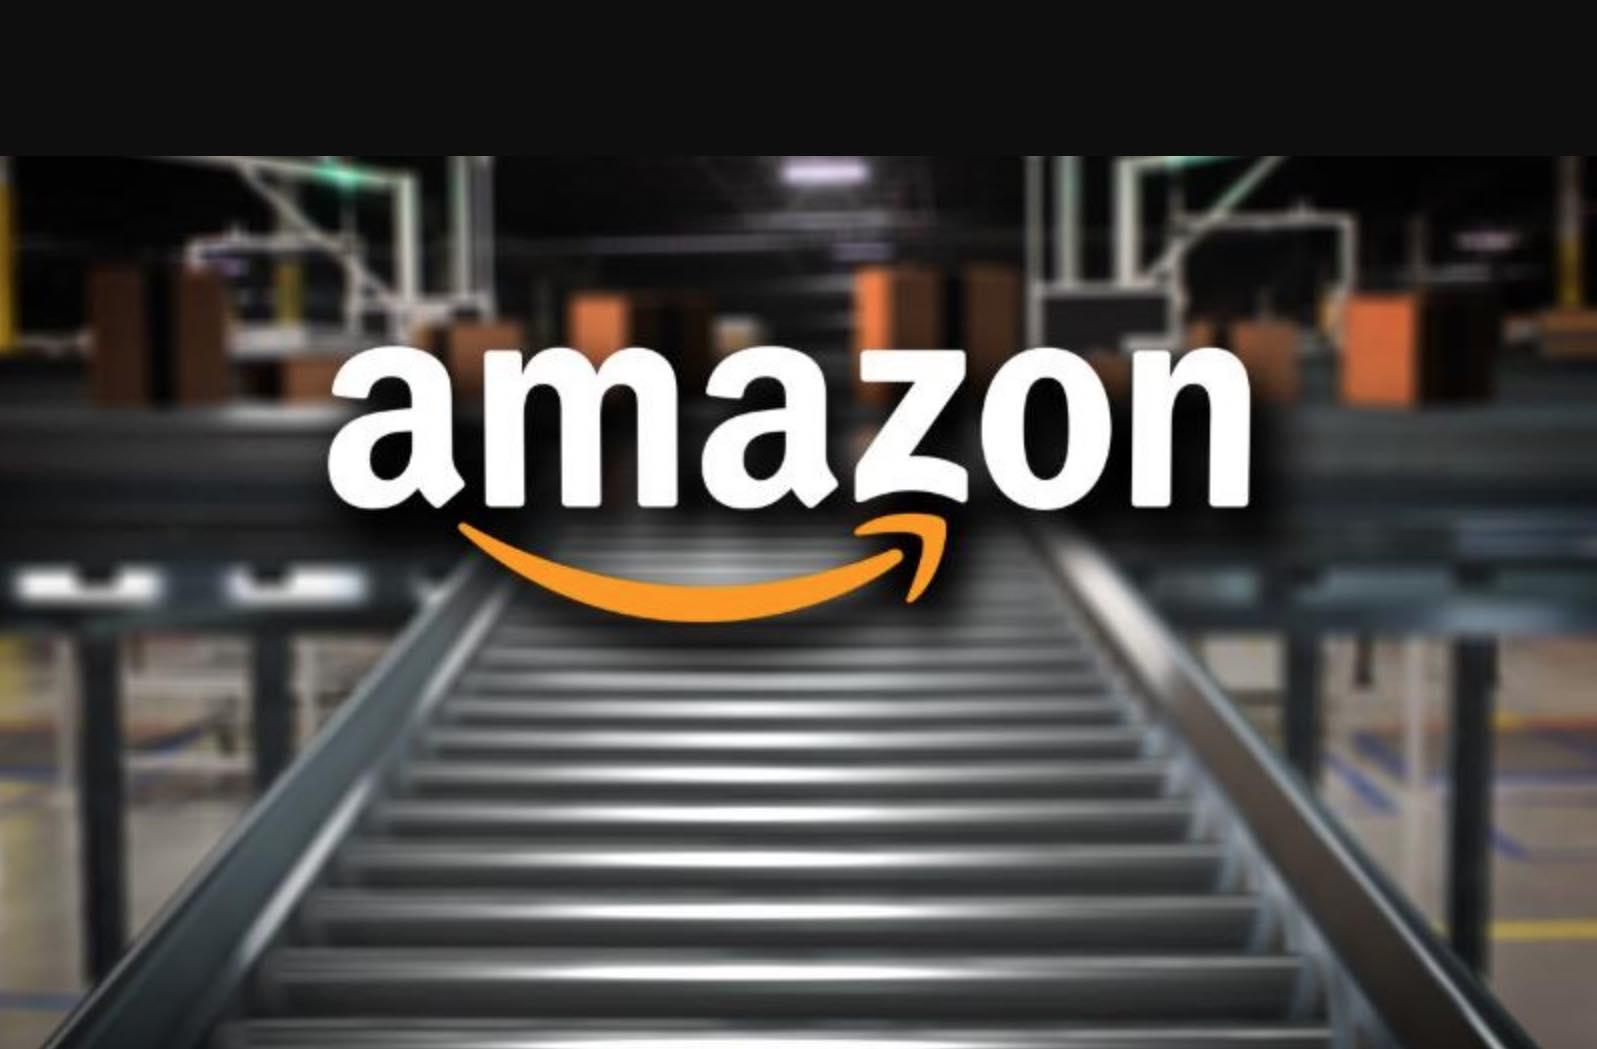 Reinstate Suspended Amazon Buyer's Account